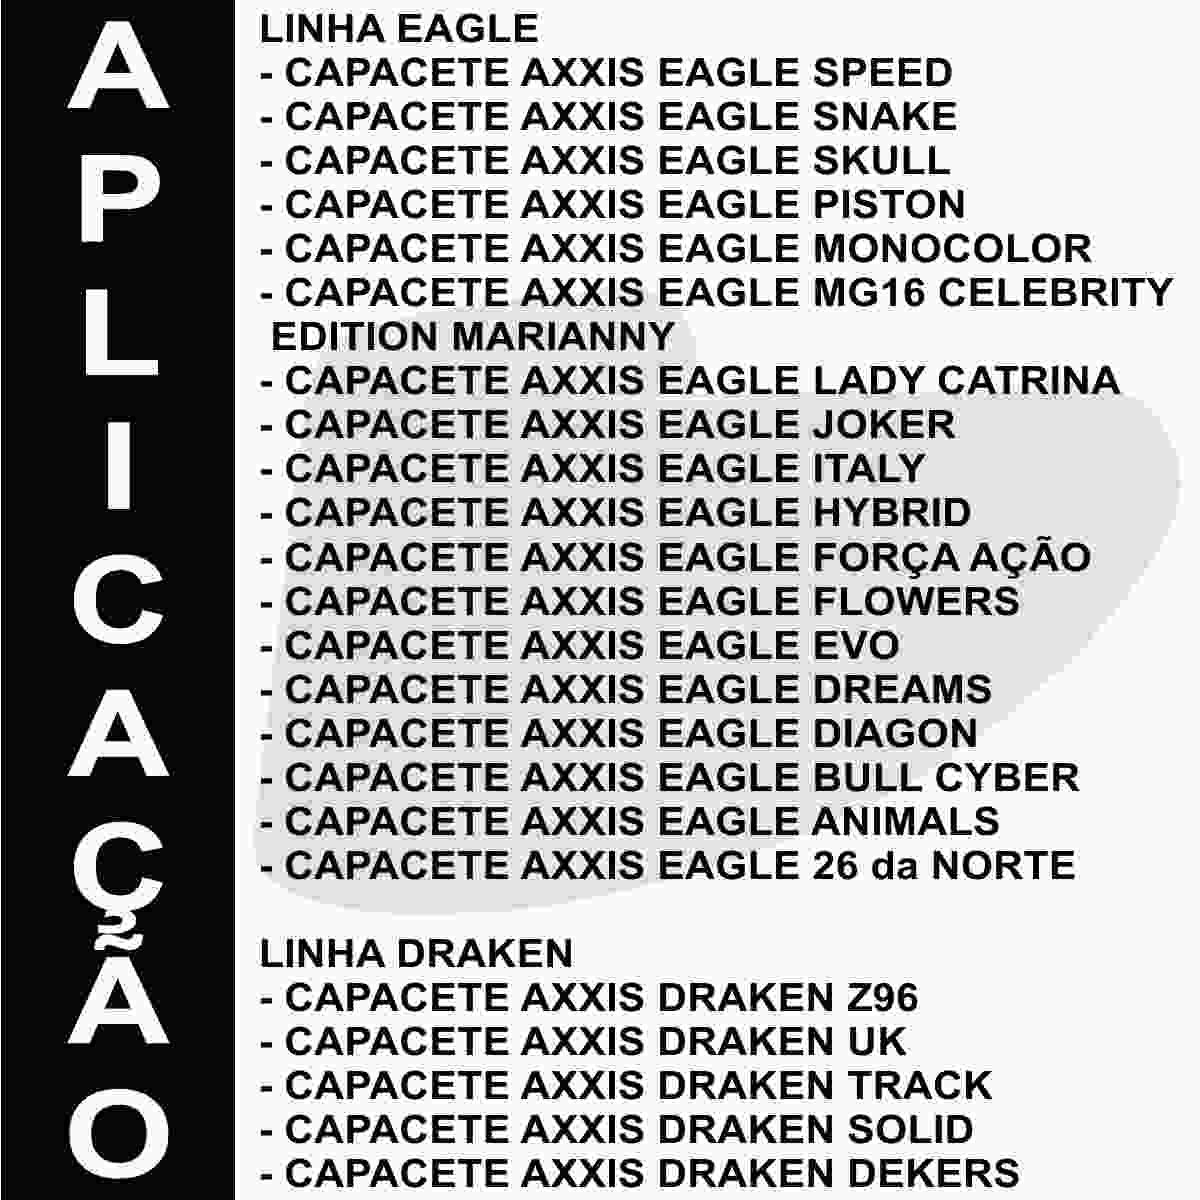 KIT VISEIRA AXXIS EAGLE/DRAKEN CLEAR CRISTAL V18 + SISTEMA DE RETENÇÃO DE VISEIRA